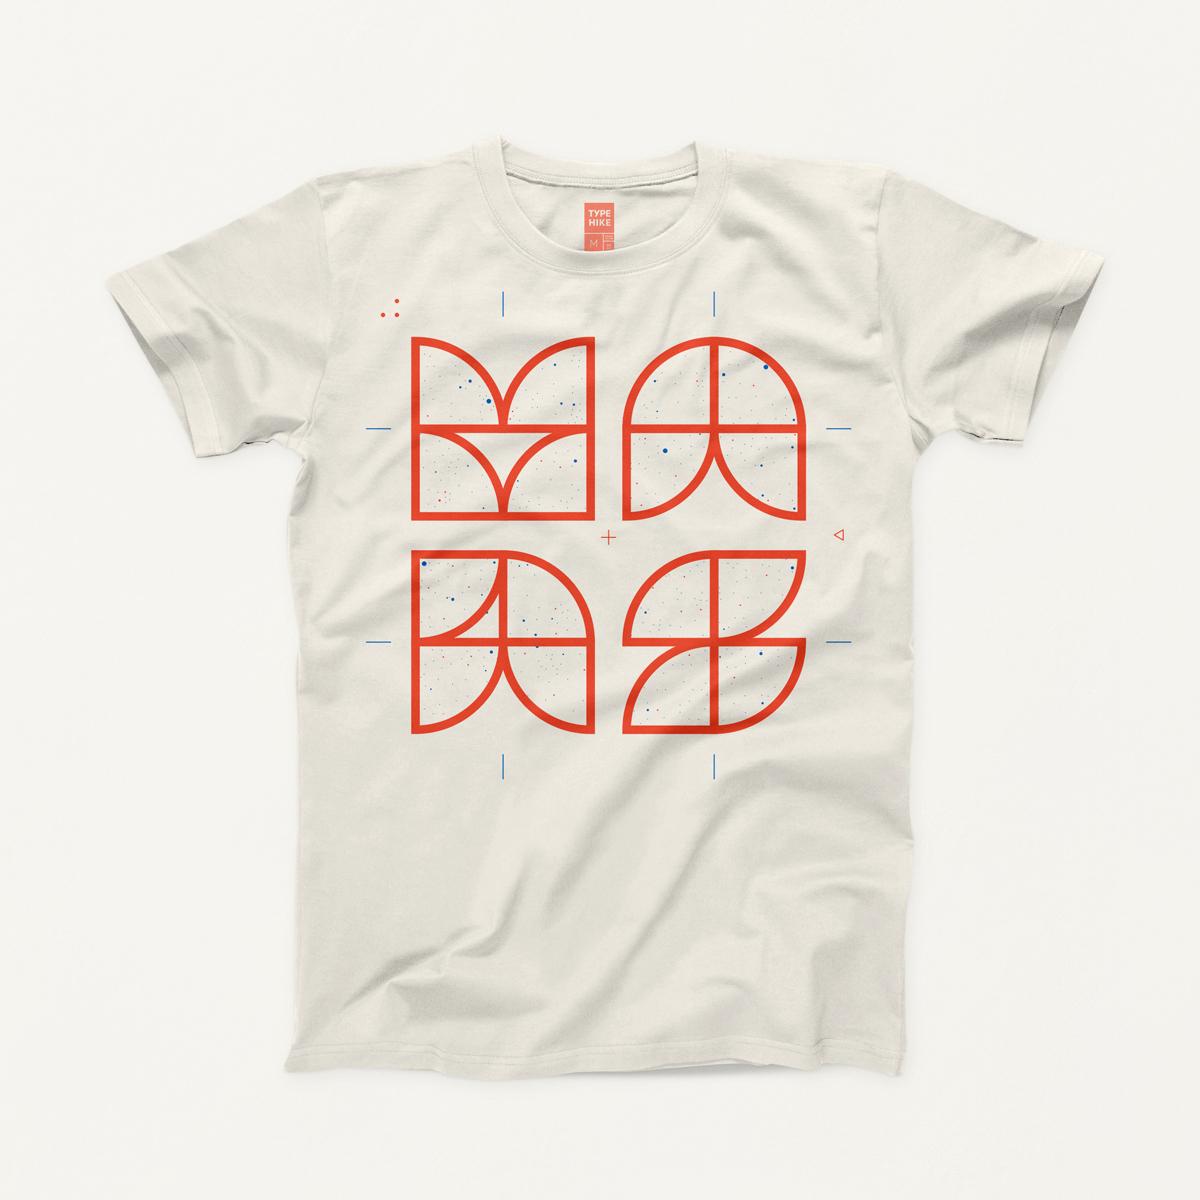 T-Shirt-Mockup-Template-MARS-natty-web.jpg